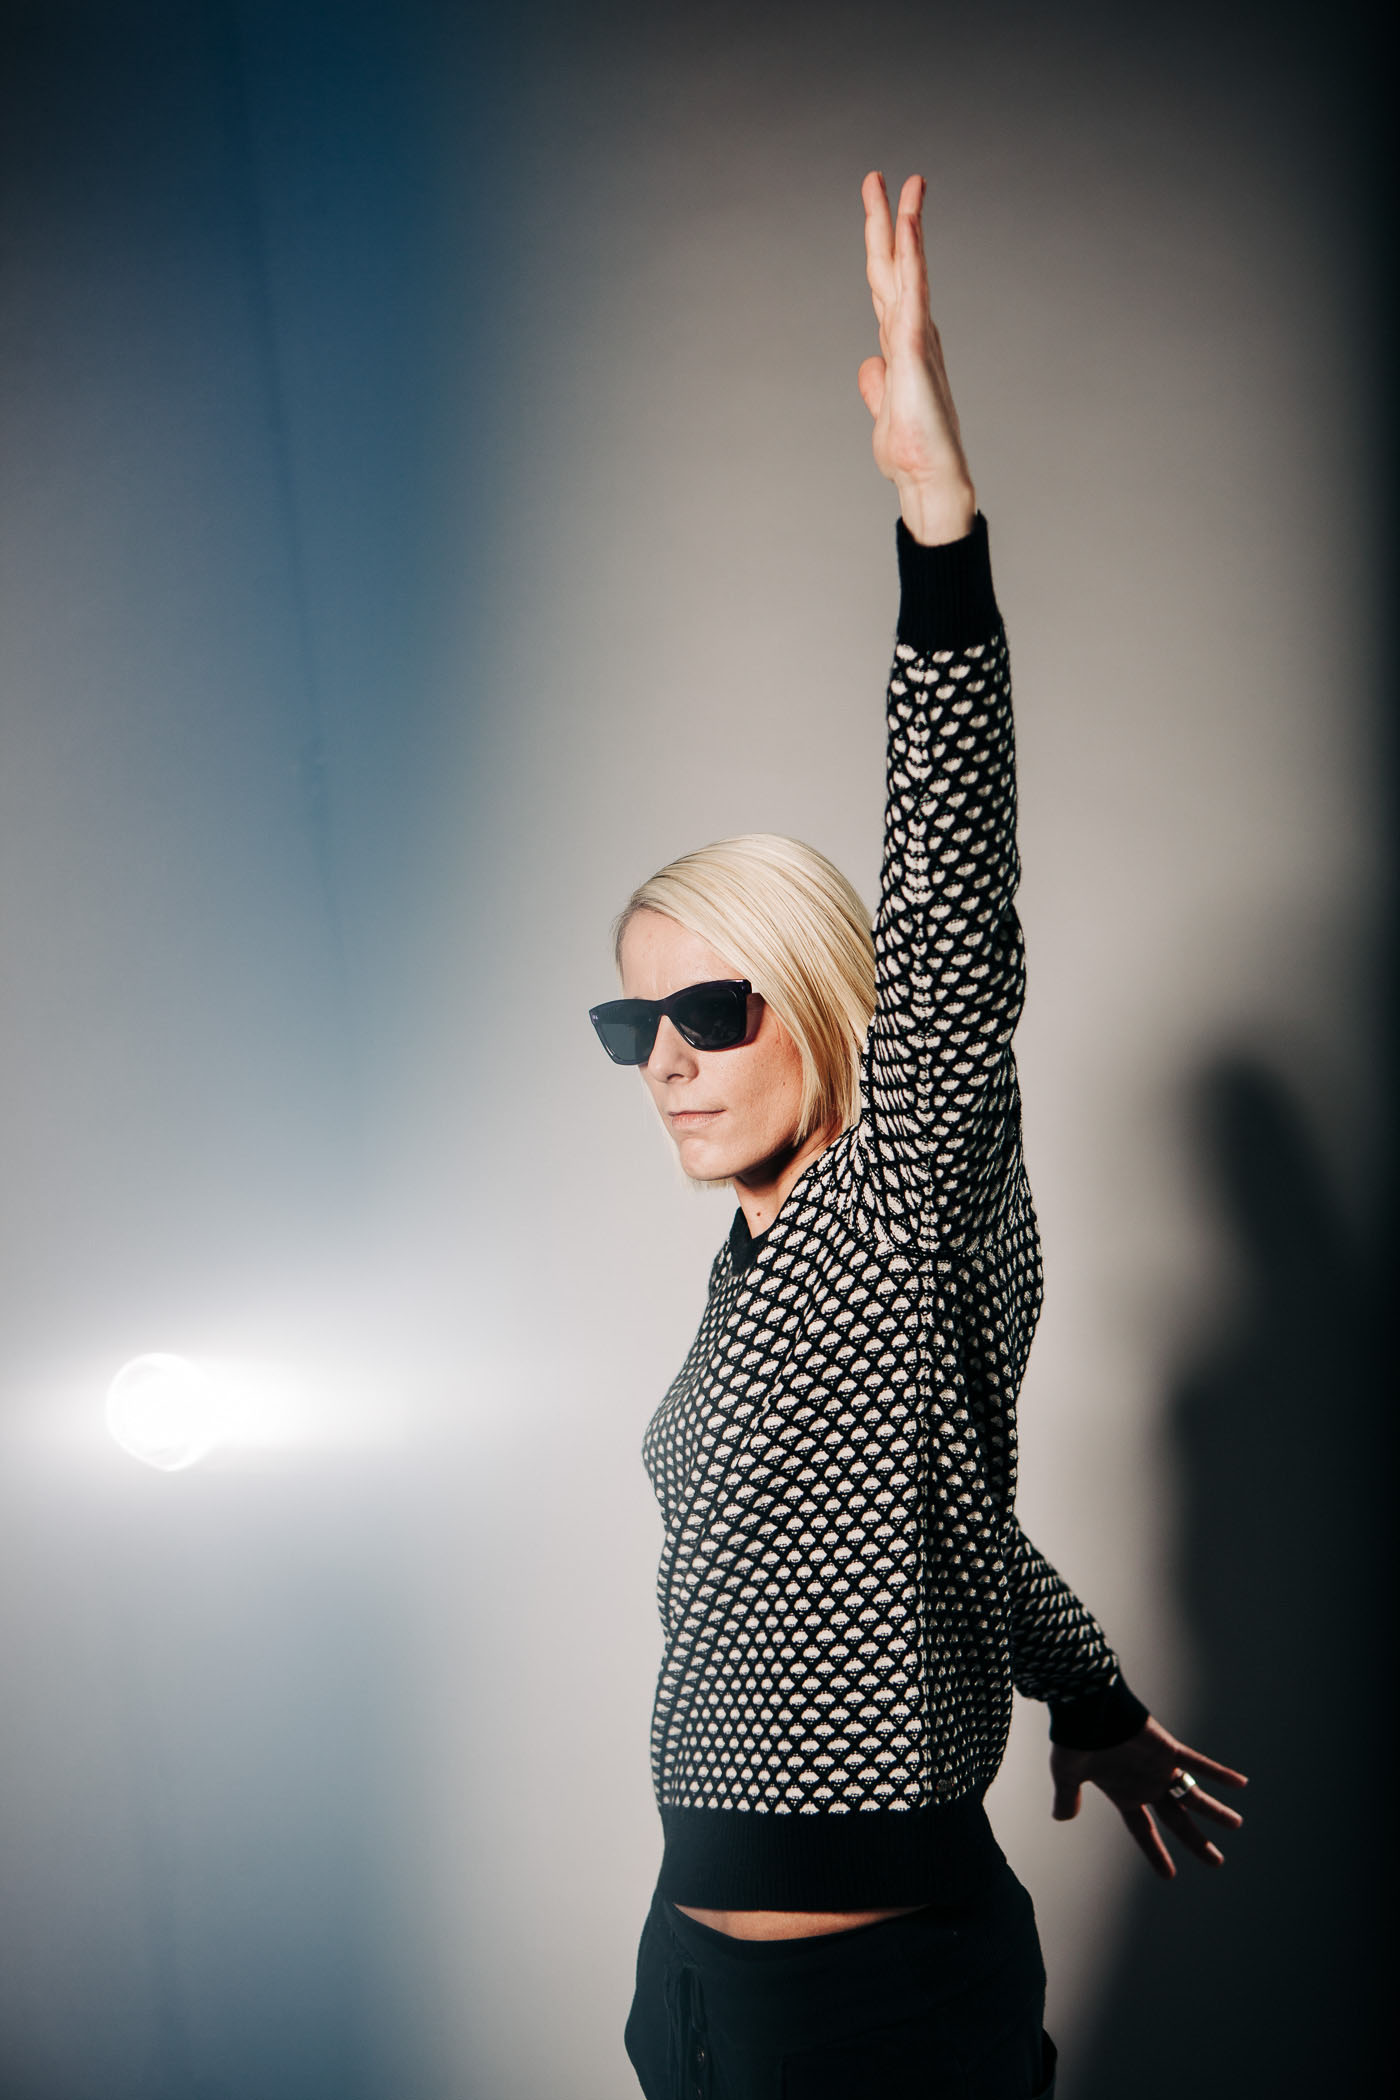 Klaudia Gawlas, DJ, DJane Florian Kresse, Portrait, Peoplefotografie, Portraitfotografie, Frankfurt, Faze Magazine